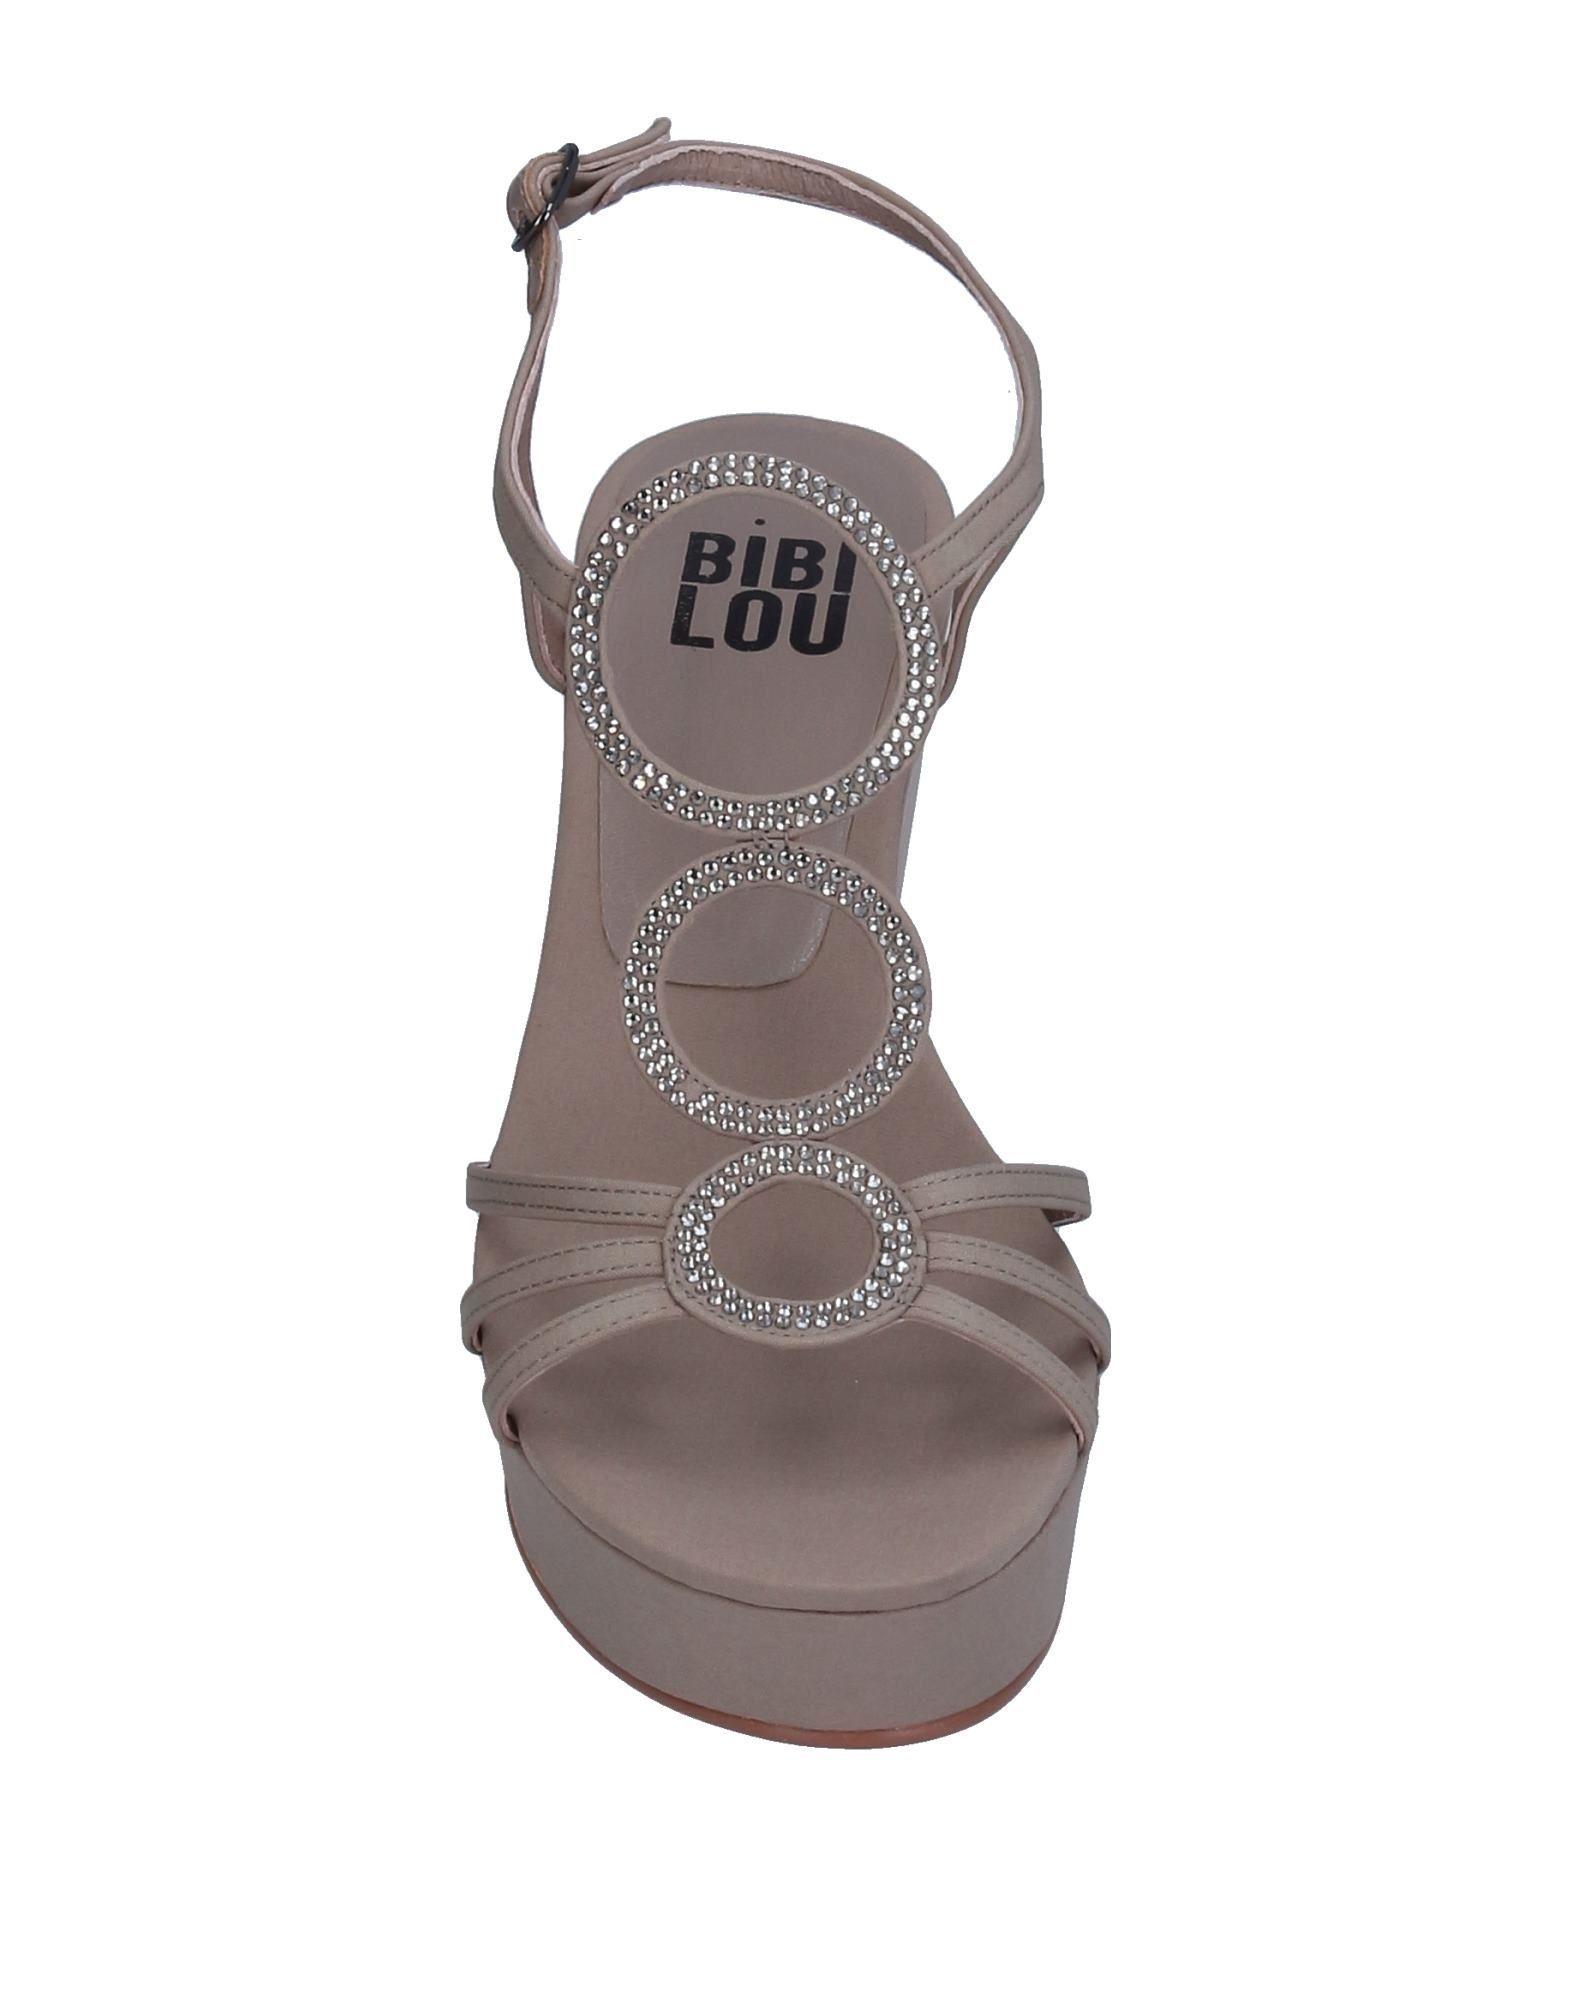 Bibi Lou Light Grey Wedge Sandals